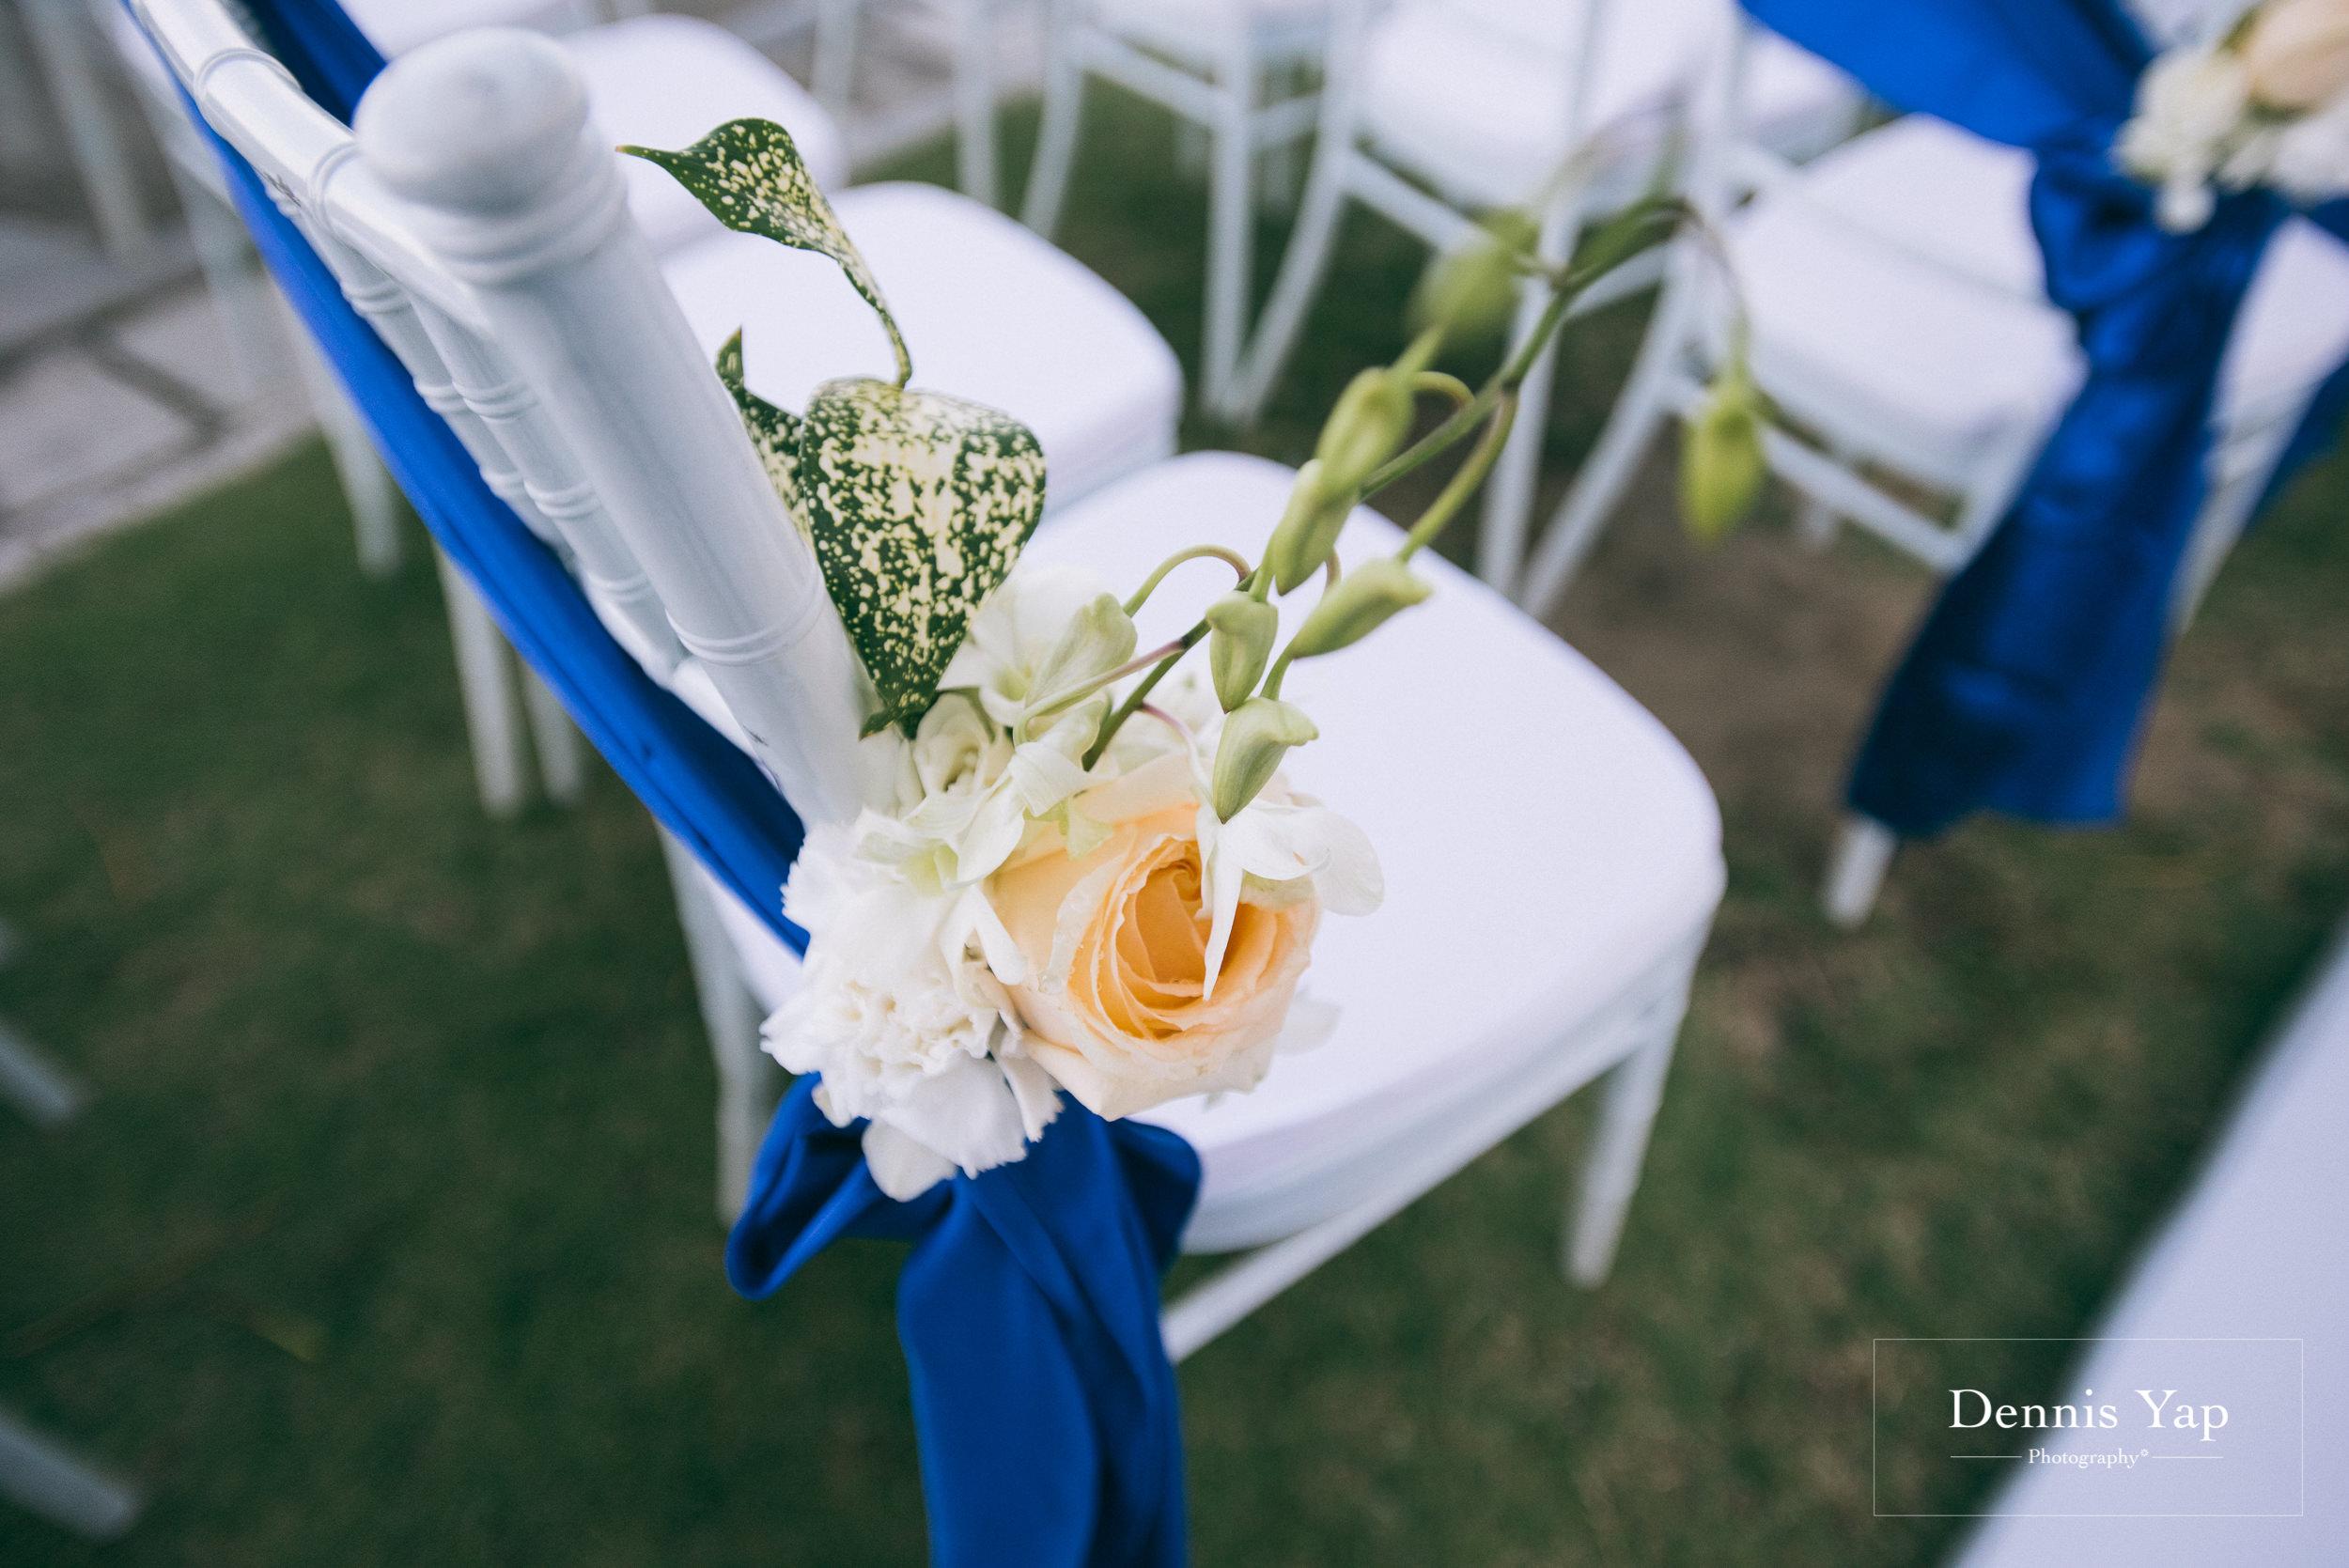 kelvin kosyilya garden wedding penang E and O hotel dennis yap indian wedding photographer-13.jpg